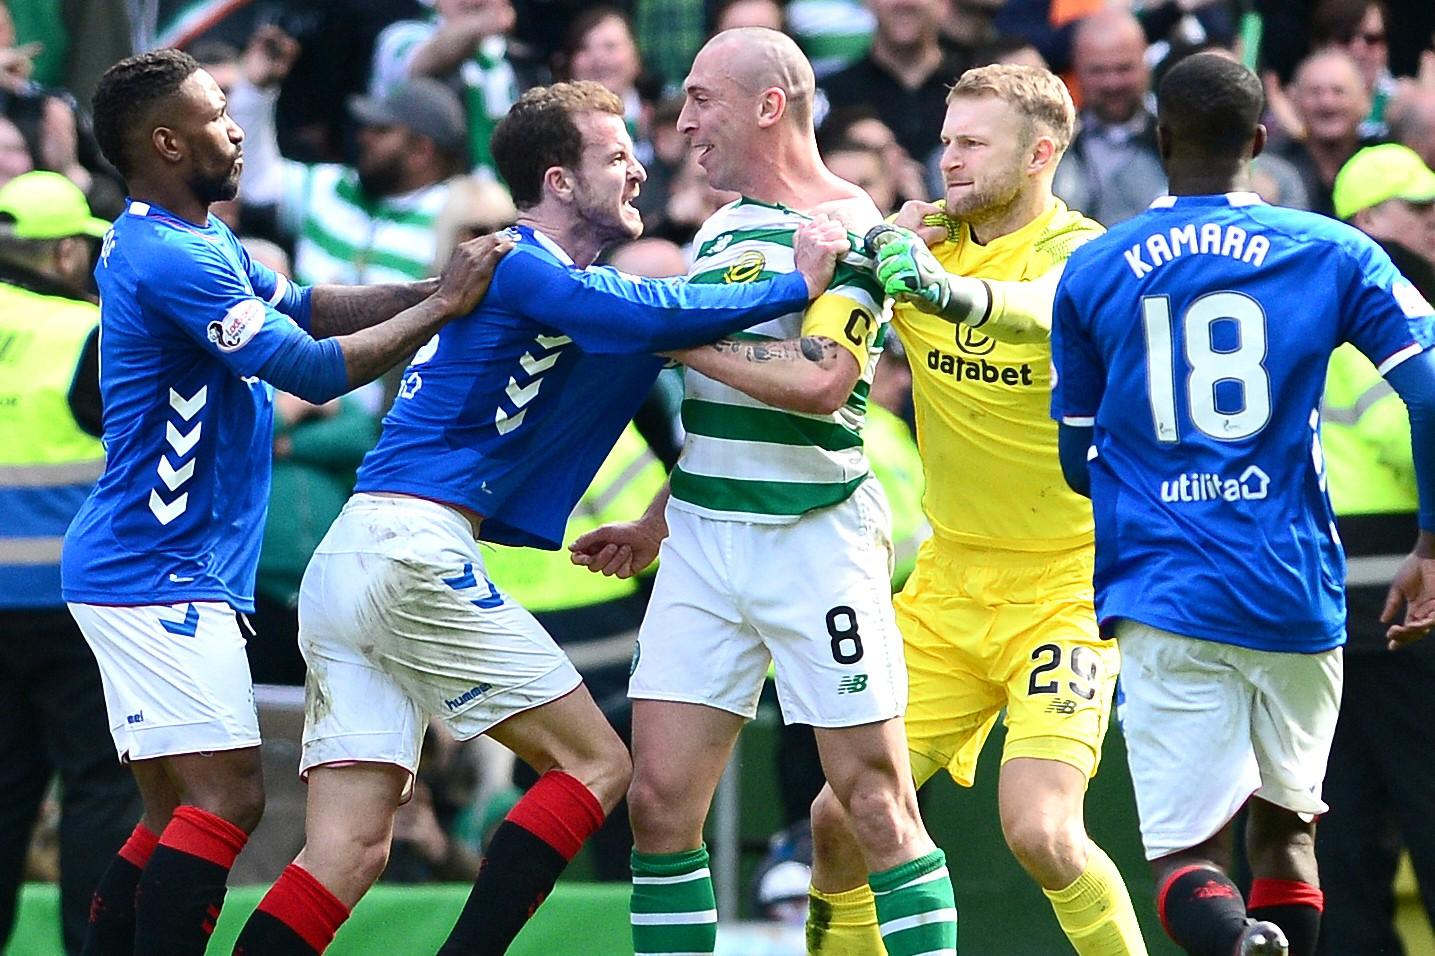 Celtic Rangers Old Firm derby